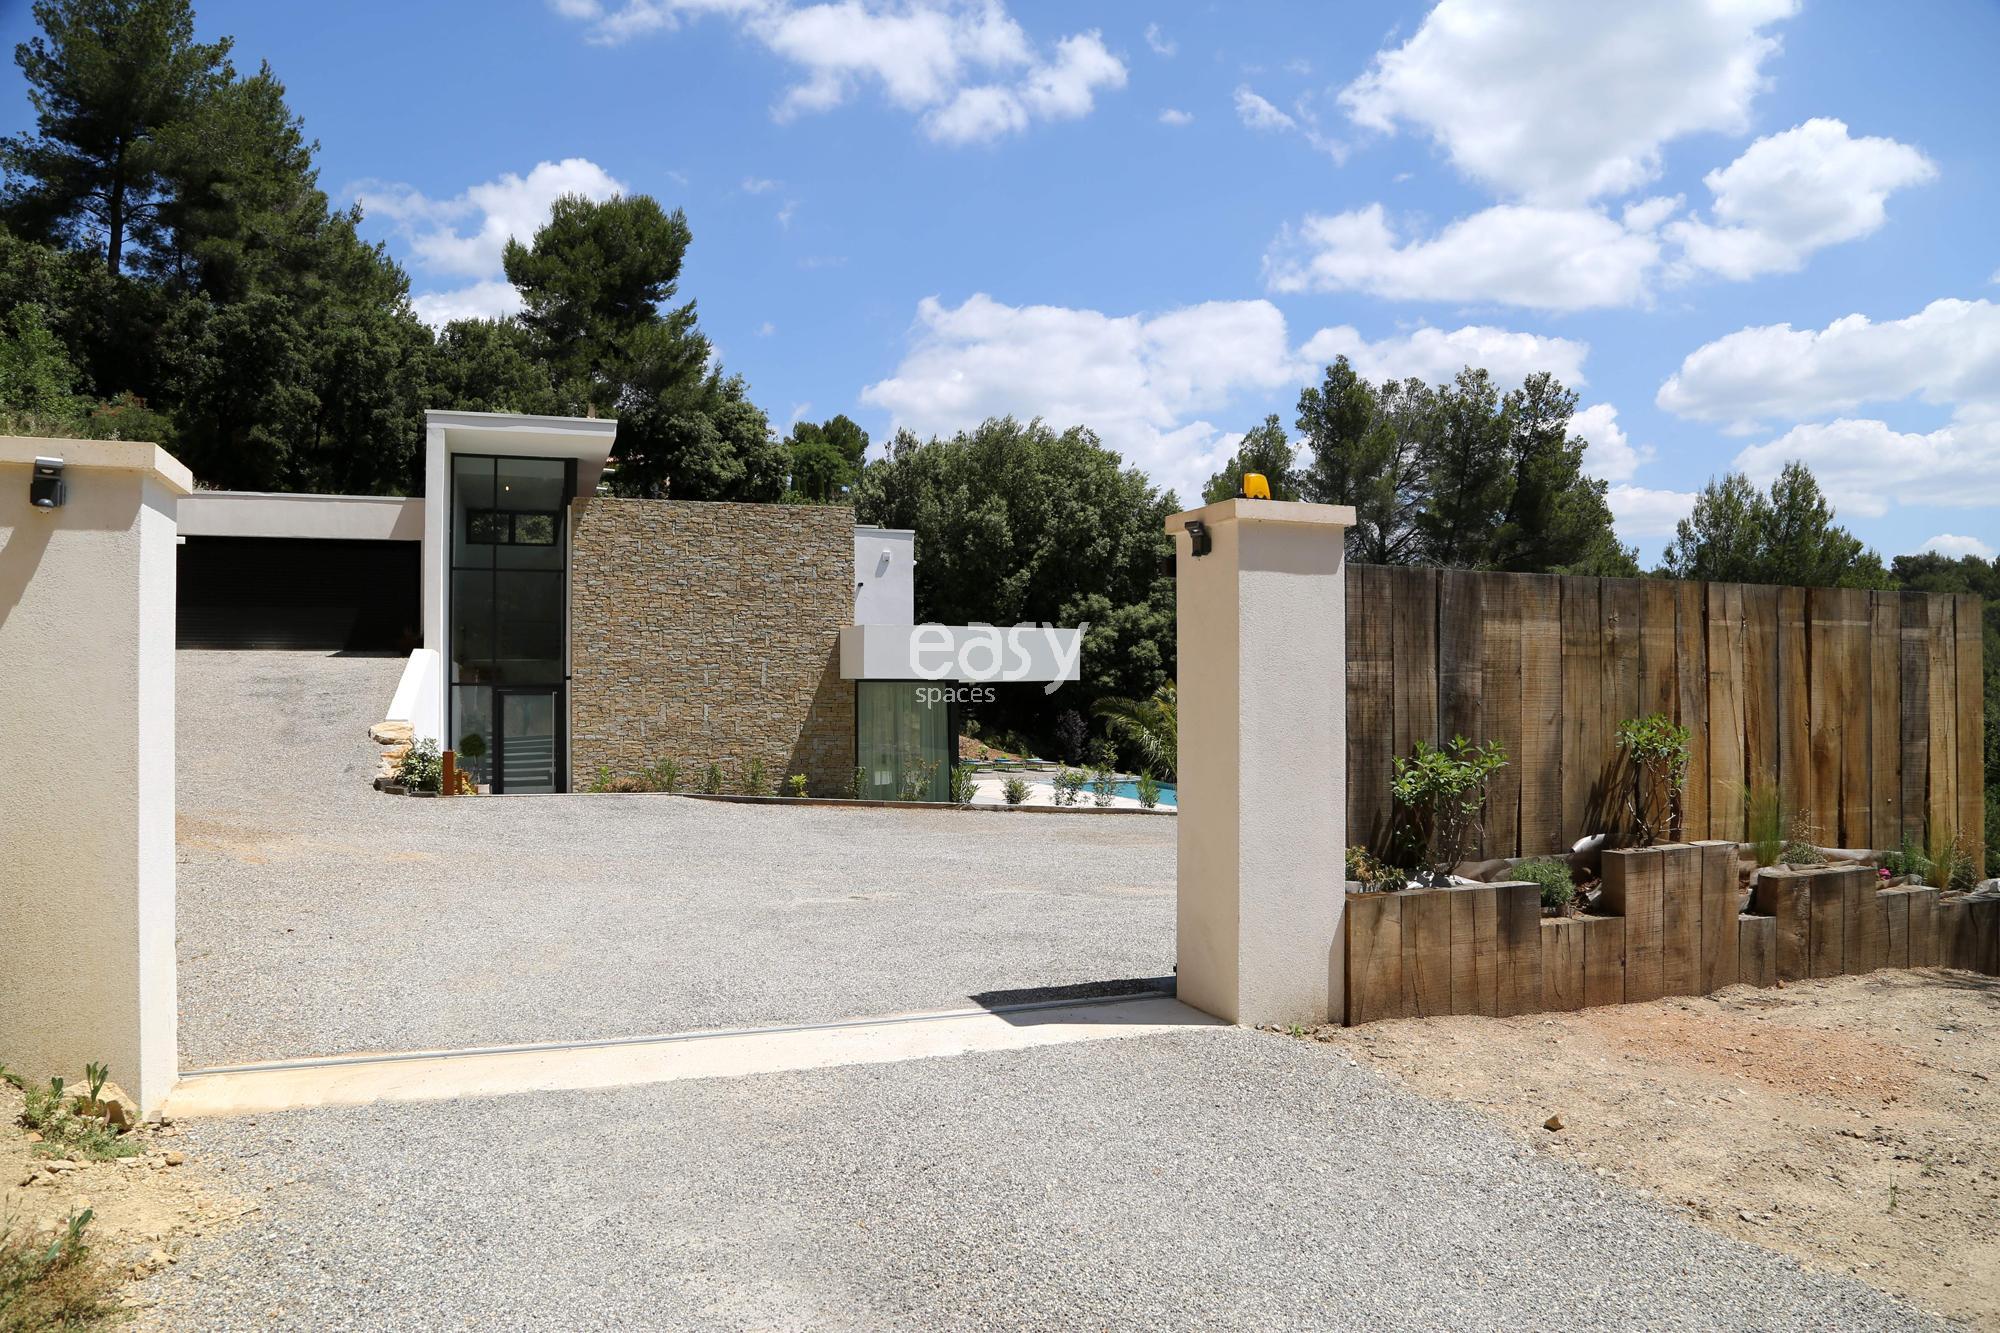 Maison ultra moderne plan maison ultra moderne maison for Maison ultra moderne